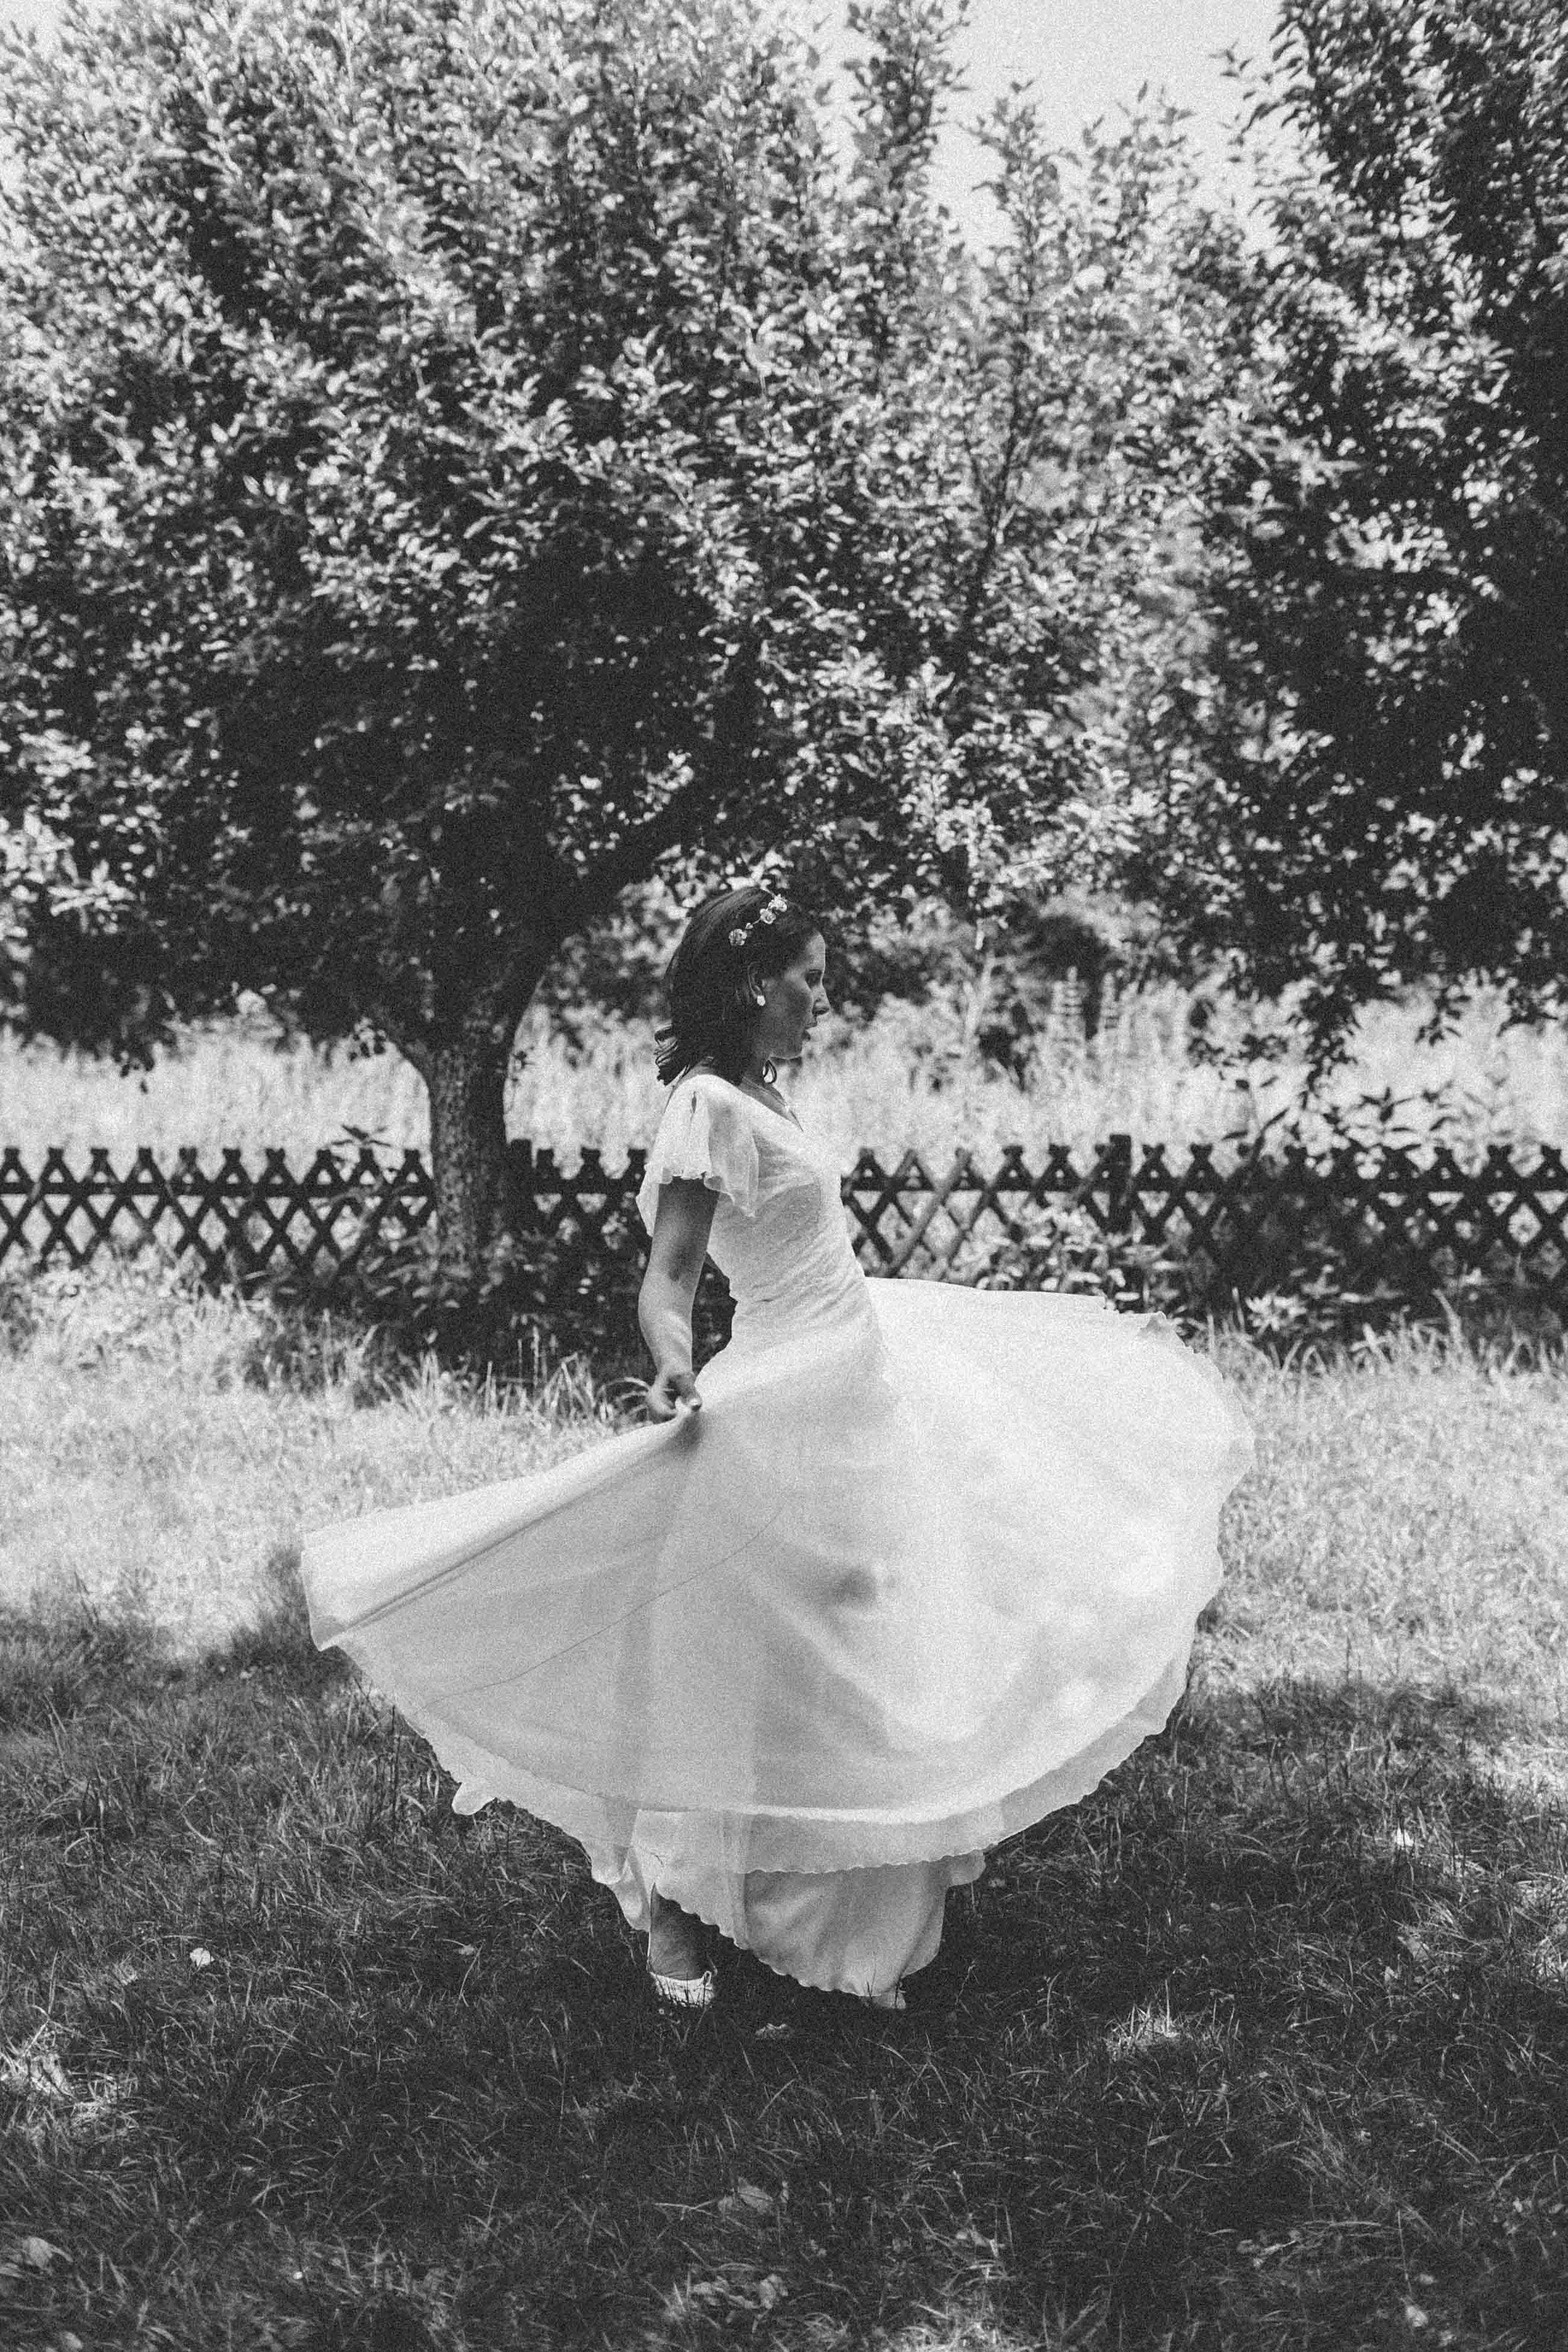 Spreewald Hochzeitsfotografie_Fran Burrows Fotografie-54.jpg